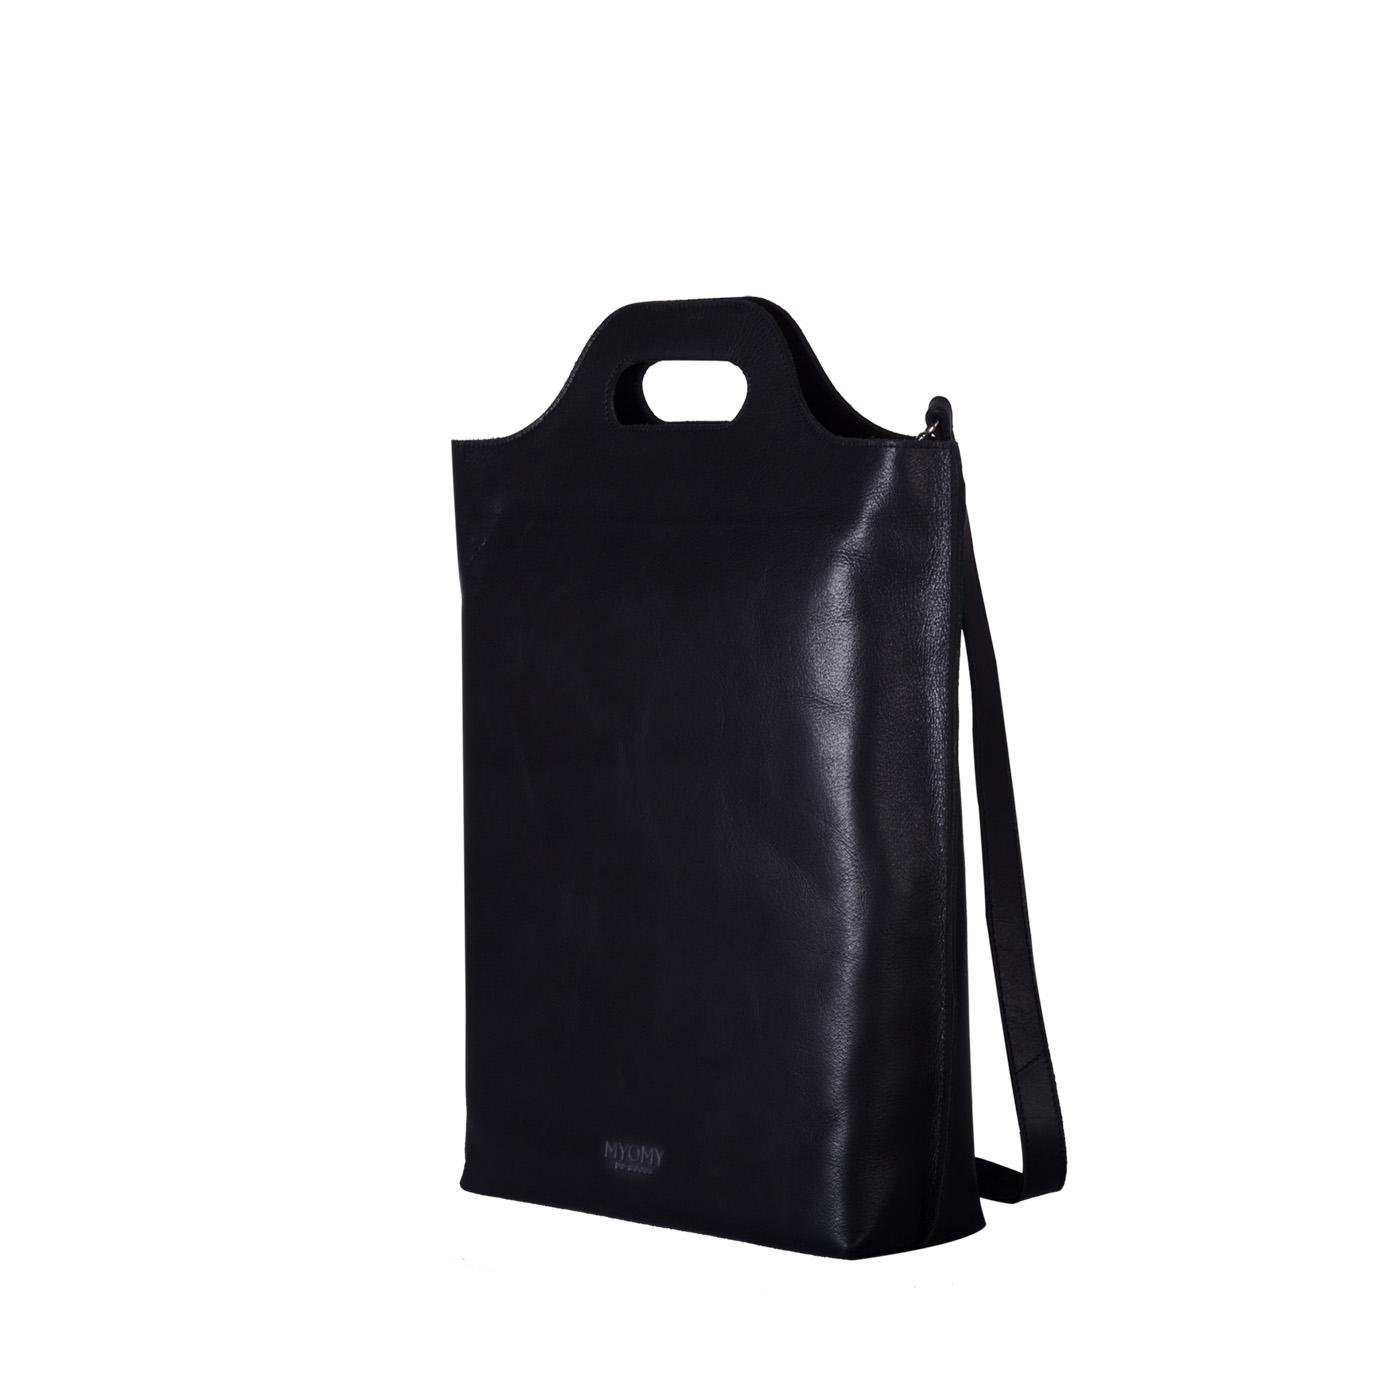 BAG CARRY waxy MY black MYOMY hunter Shopper wq5HOdxOI